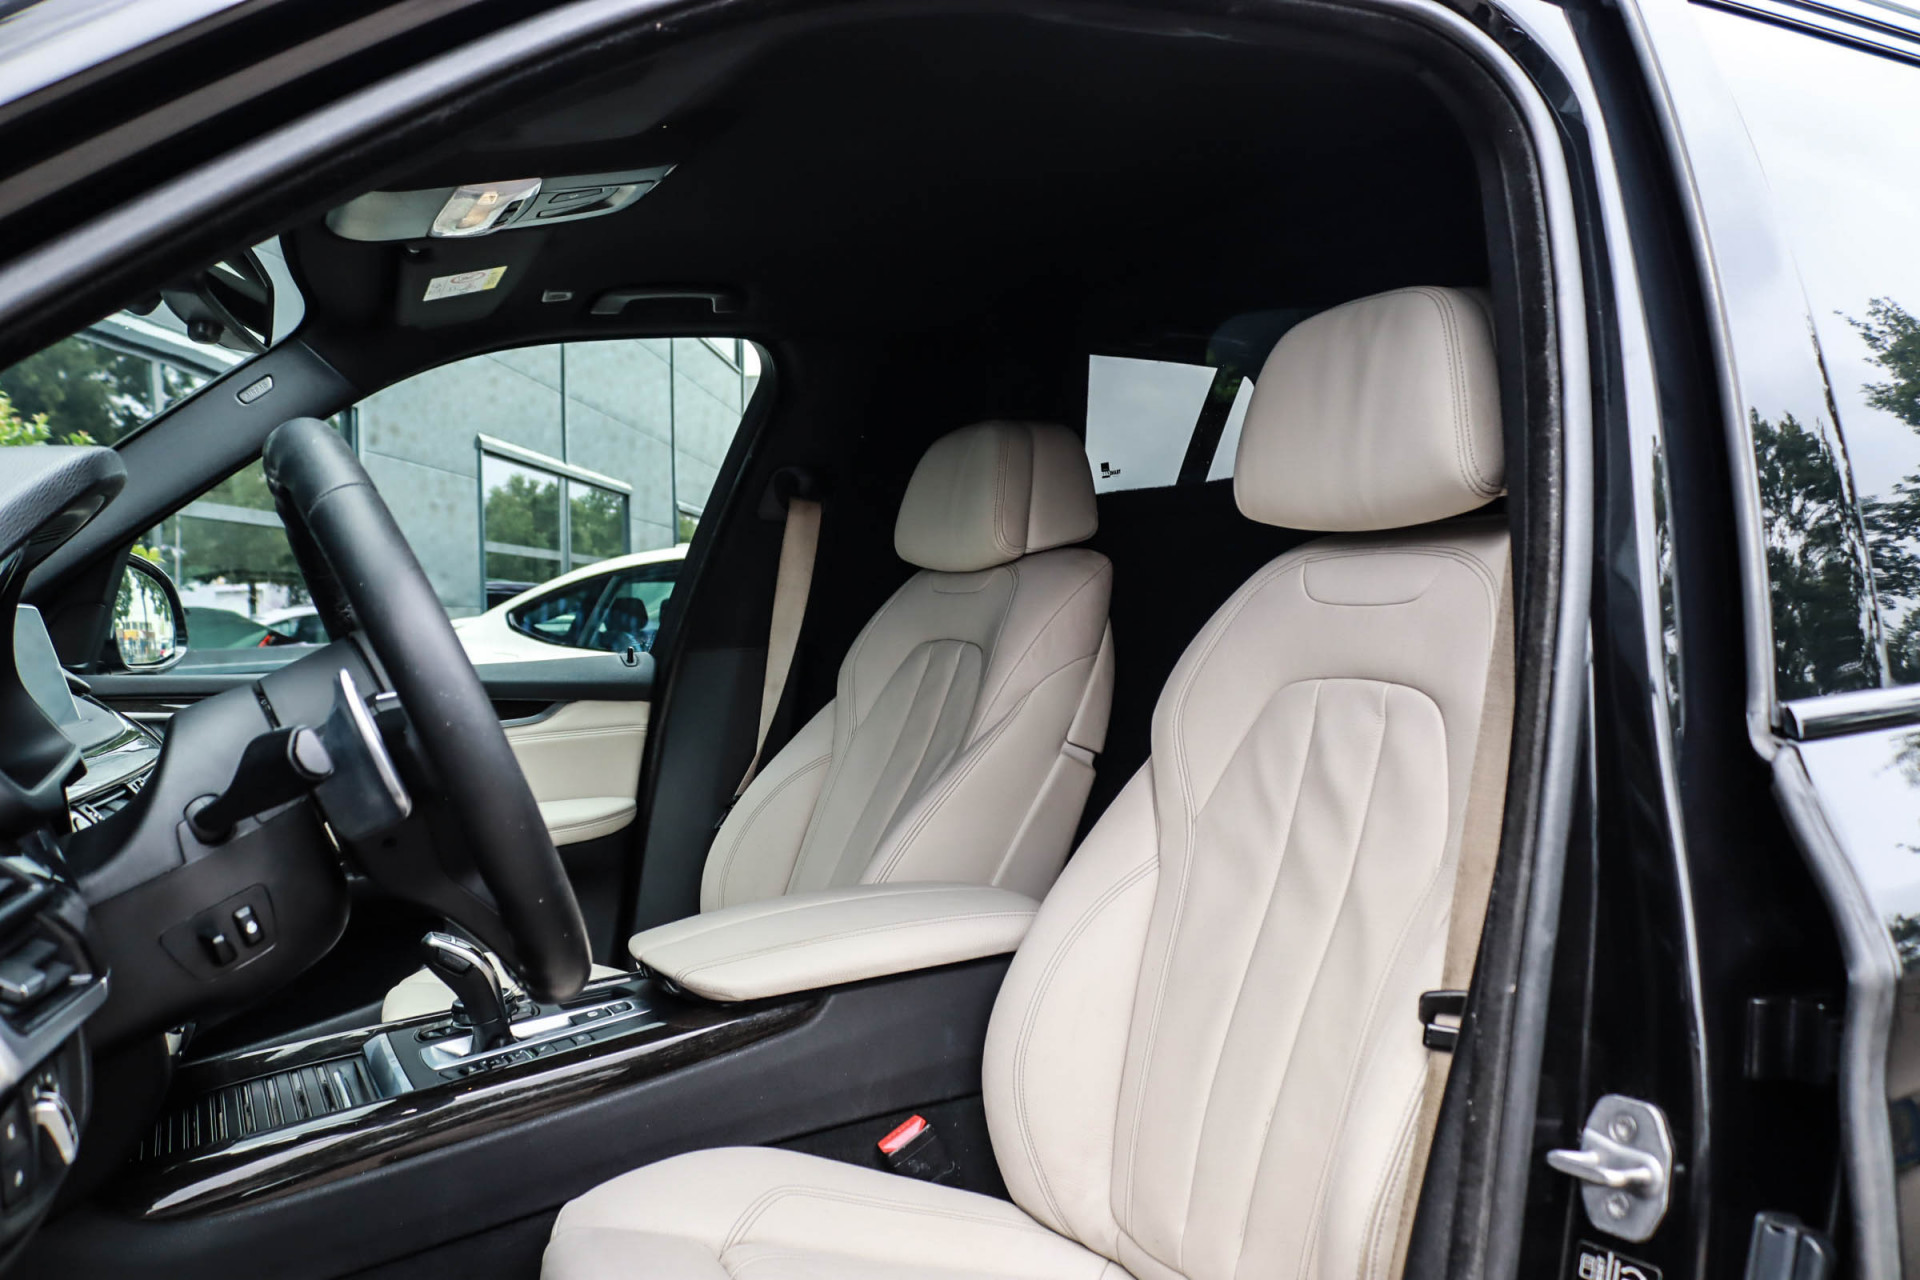 Tweedehands BMW X5 M Sport 2014 occasion